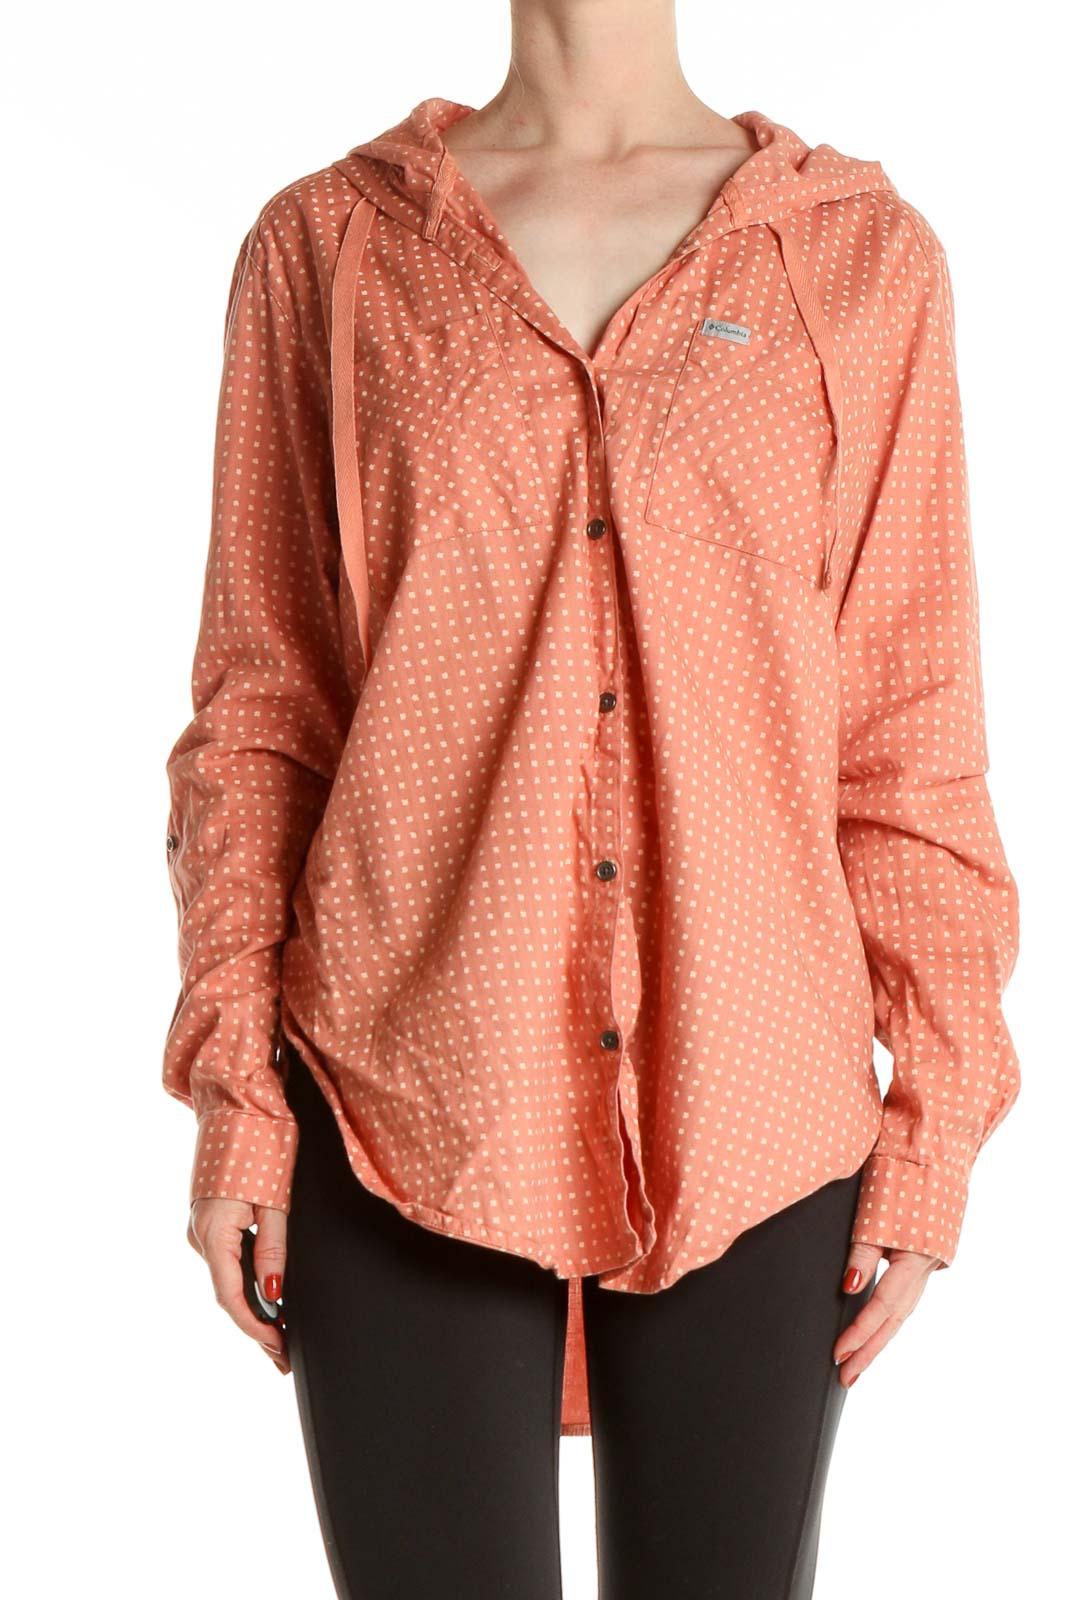 Orange Polka Dot Activewear Shirt Front